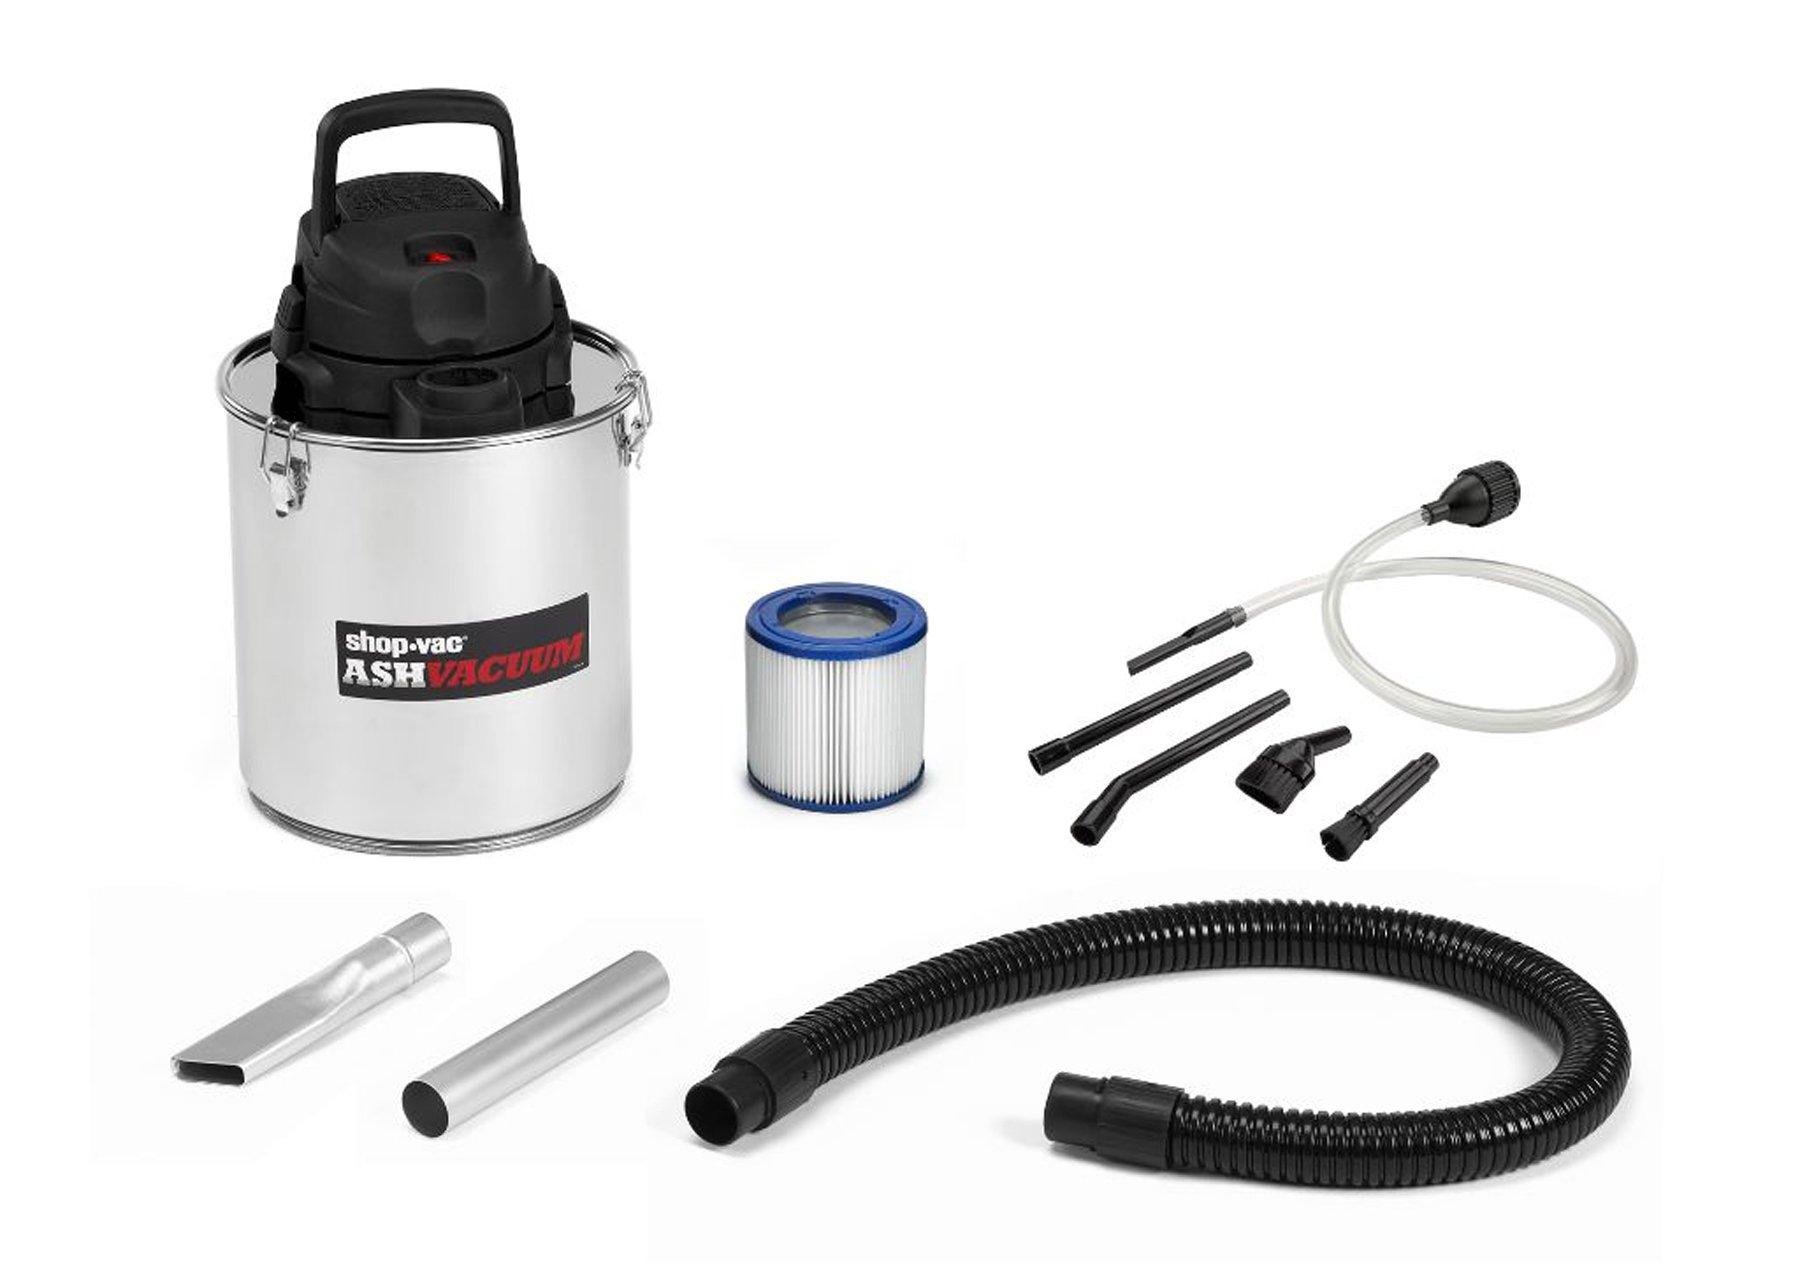 Shop-Vac 4041300 Ash Vacuuum, Stainless Steel, 5 gallon